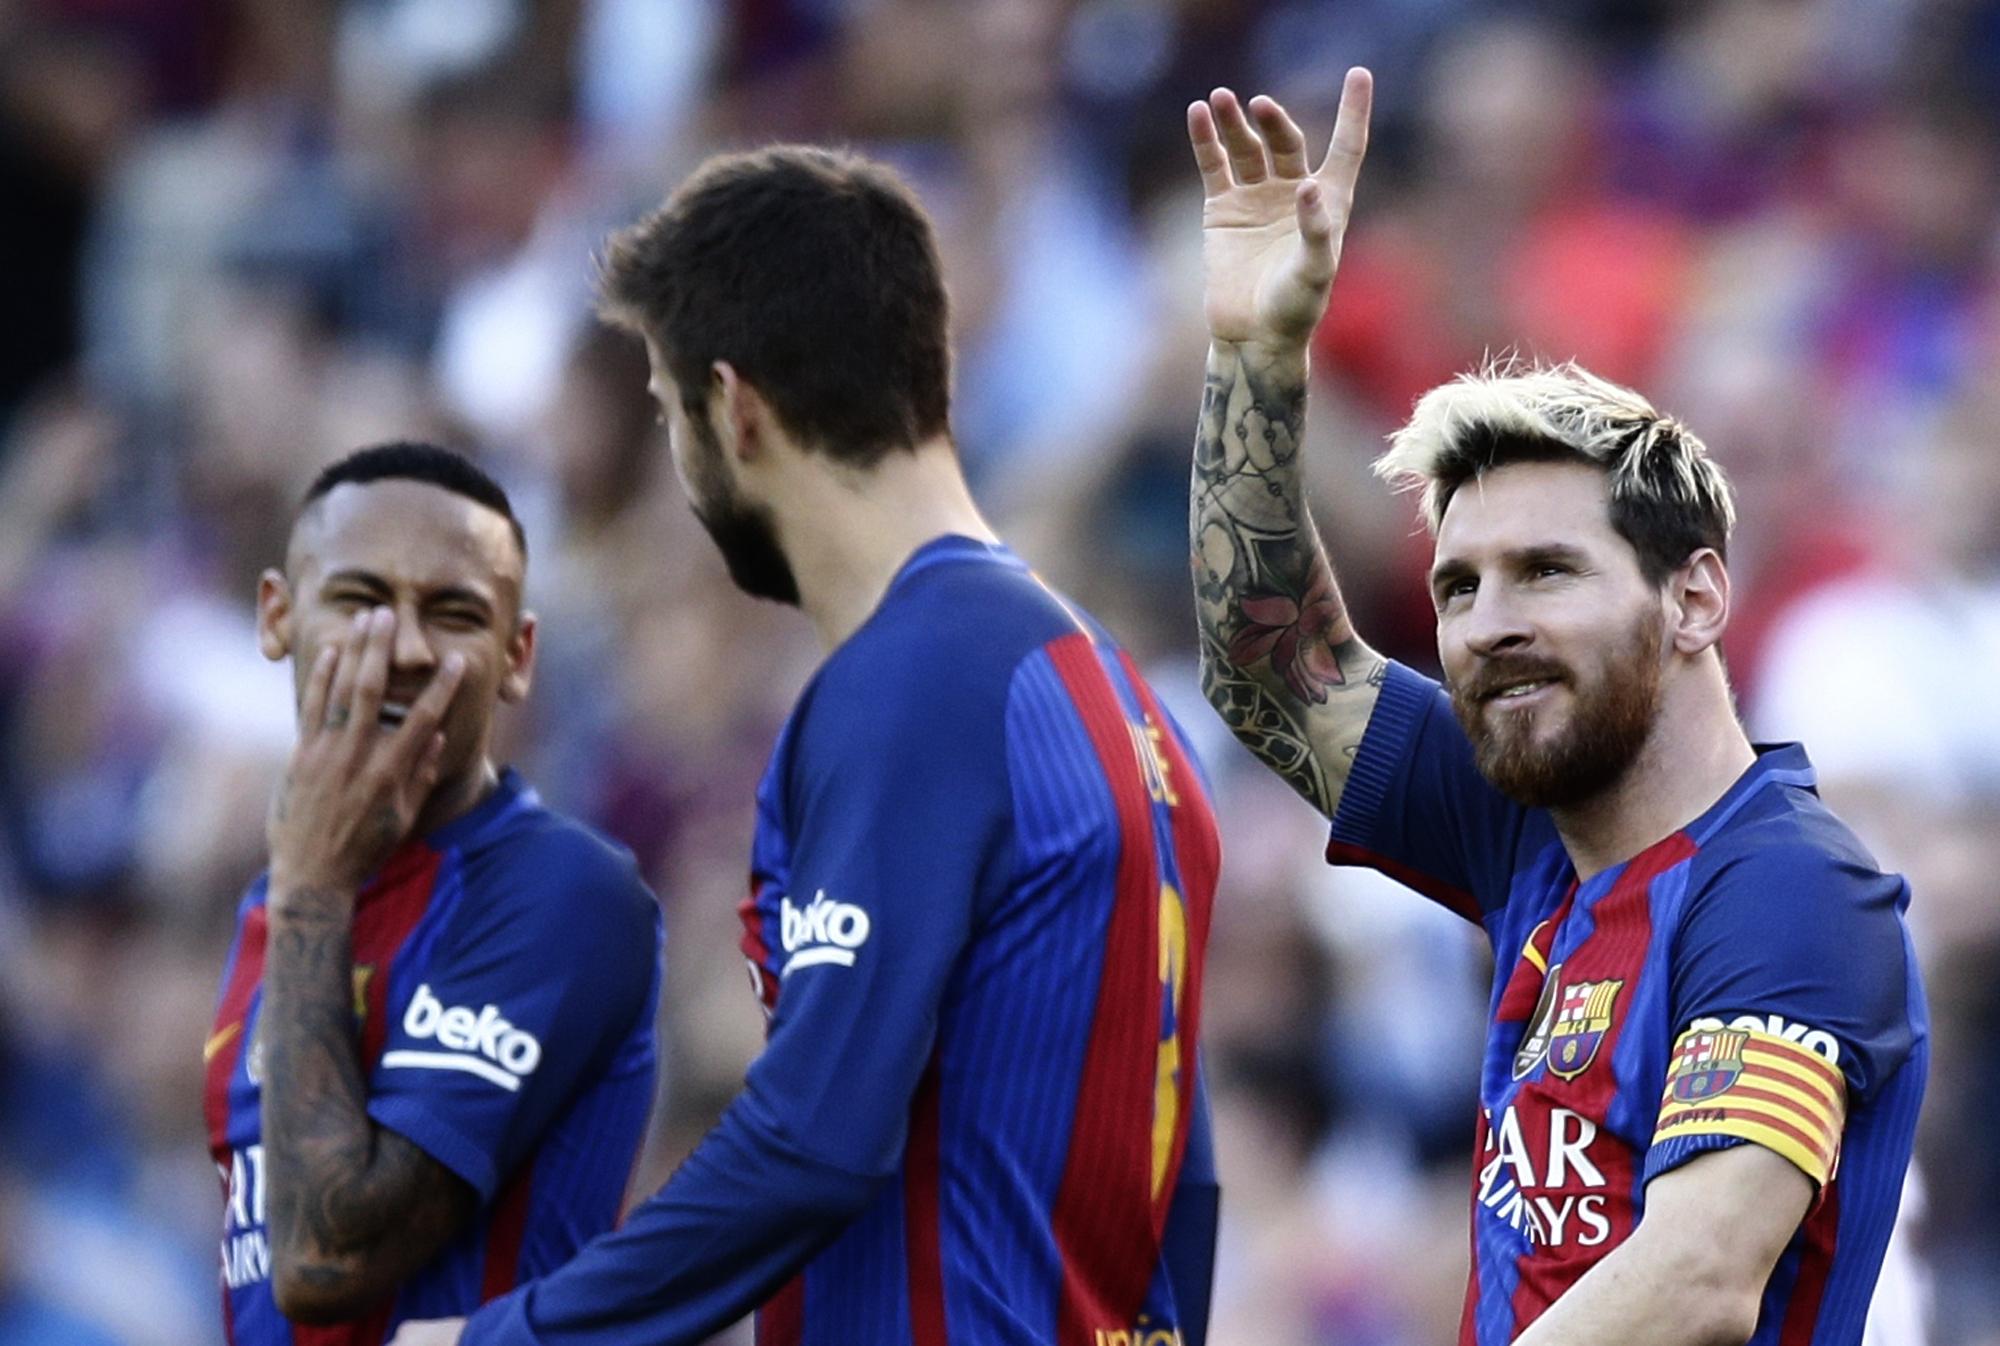 Classy Barcelona coach Valverde: Alaves can feel unlucky; Coutinho will improve